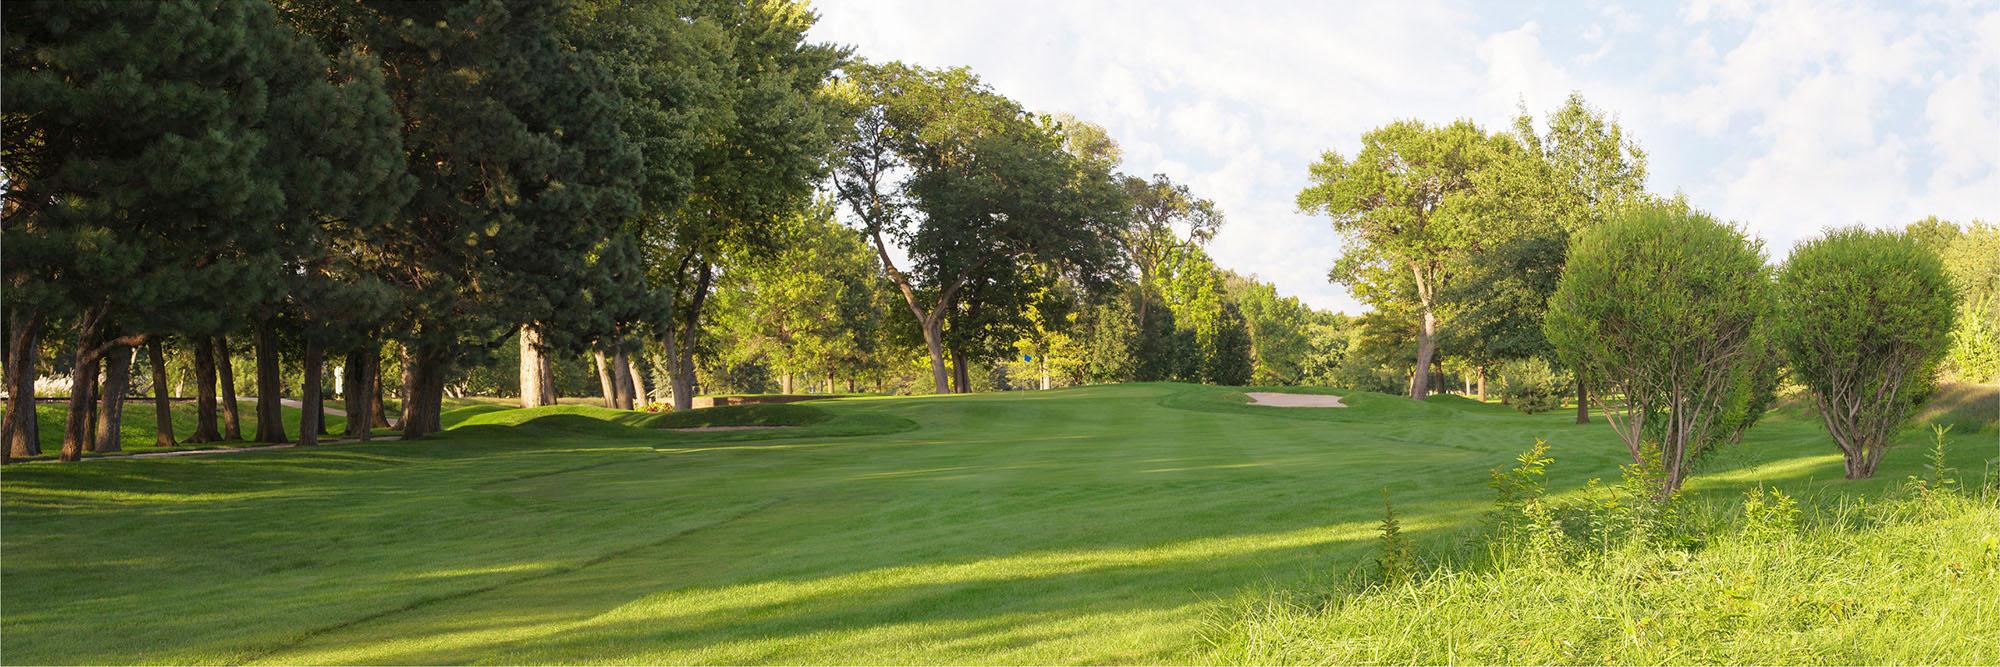 Golf Course Image - Fremont No. 2